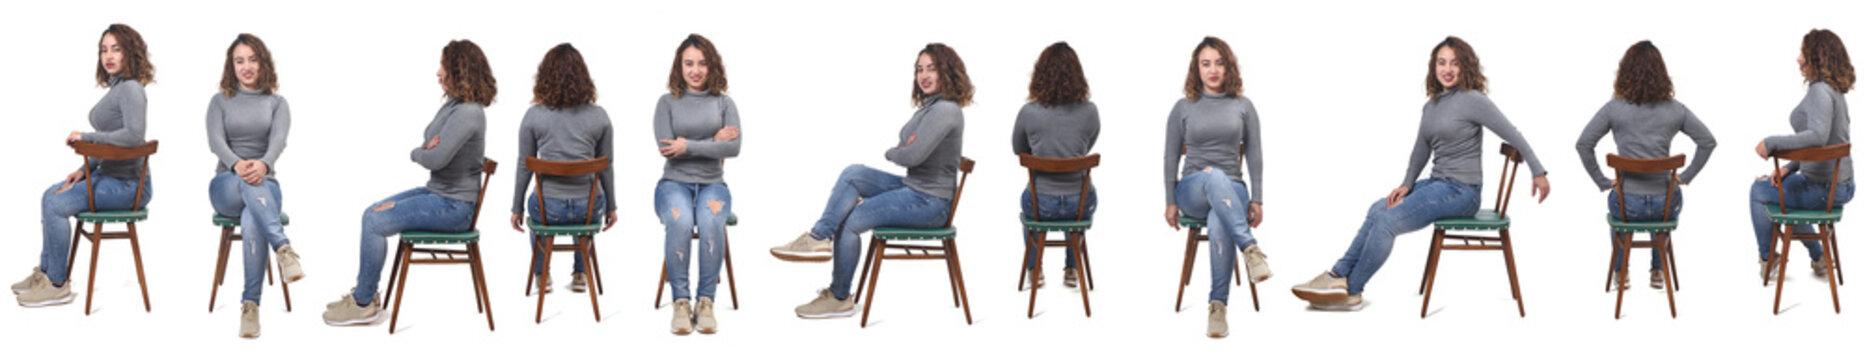 large line of samen woman sitting on white background